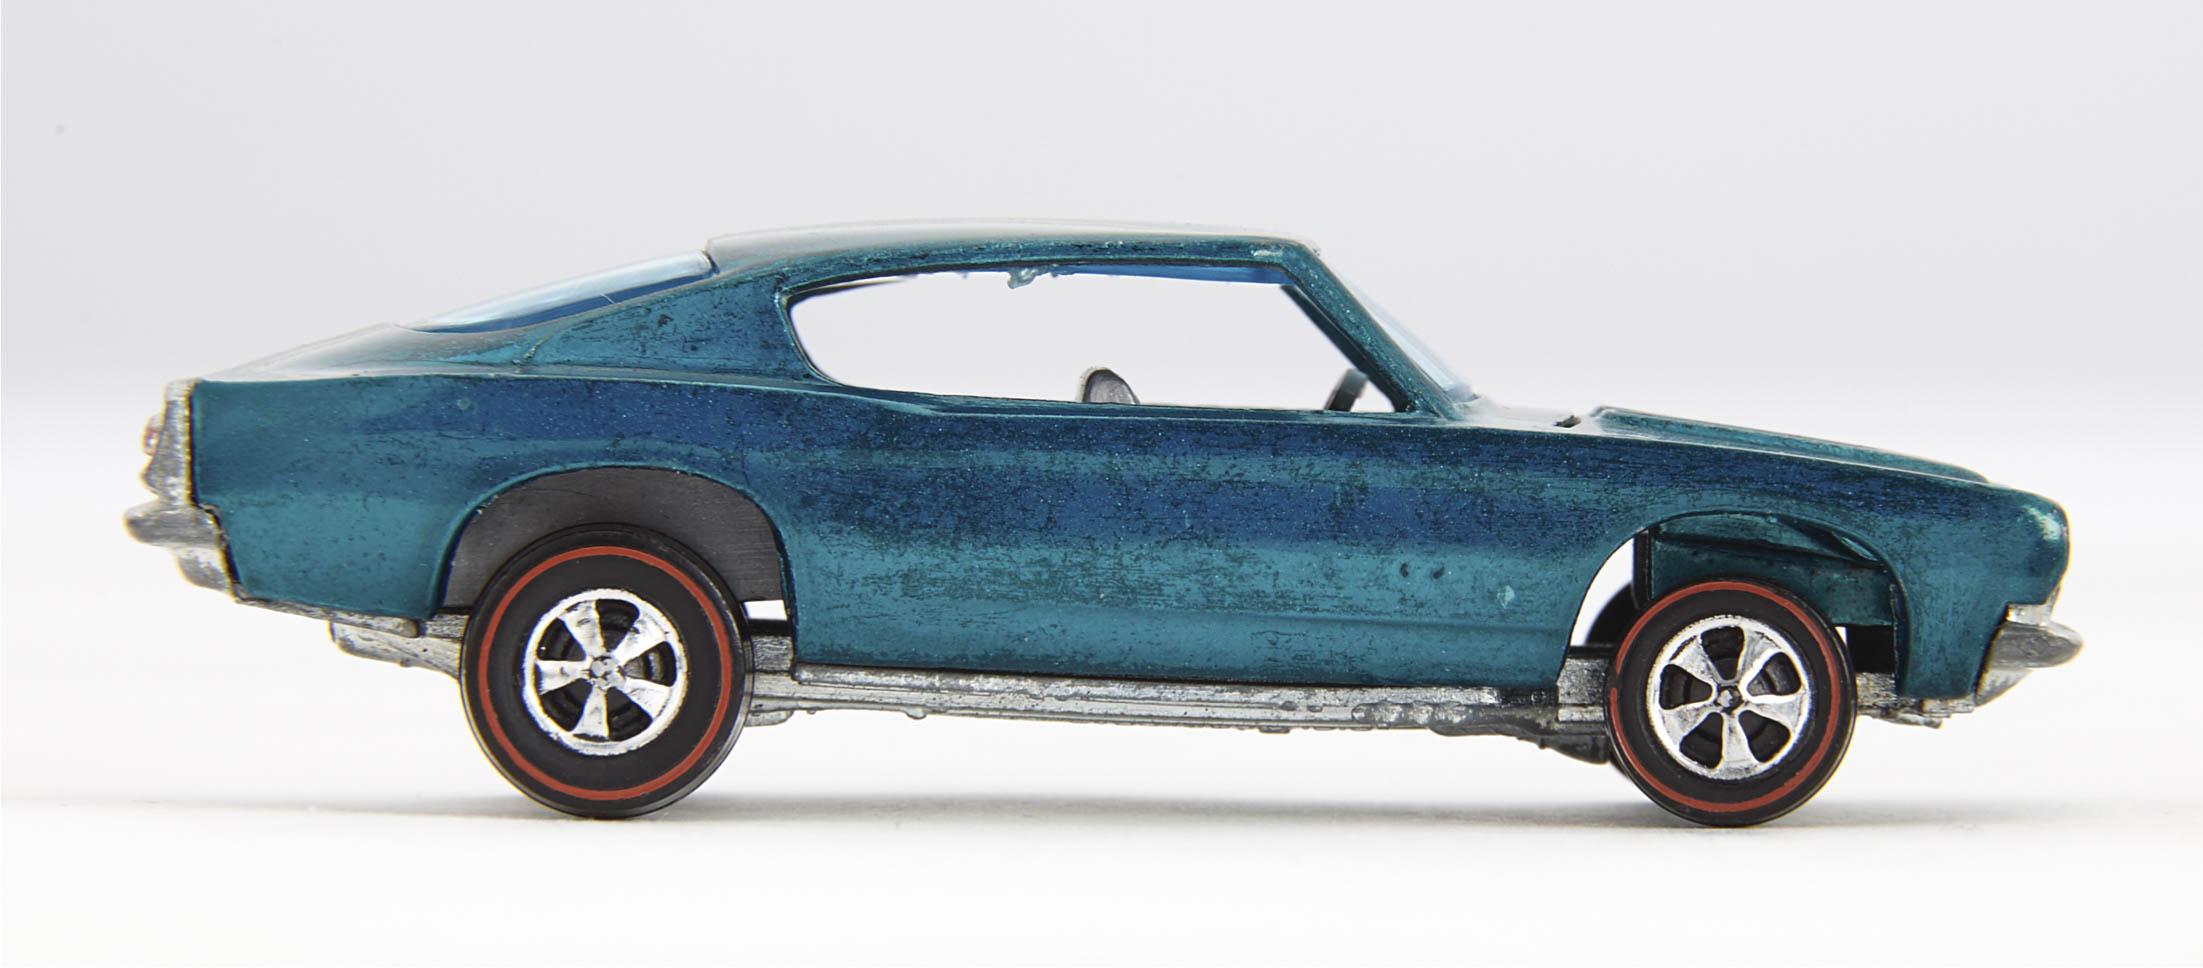 1967 Barracuda side